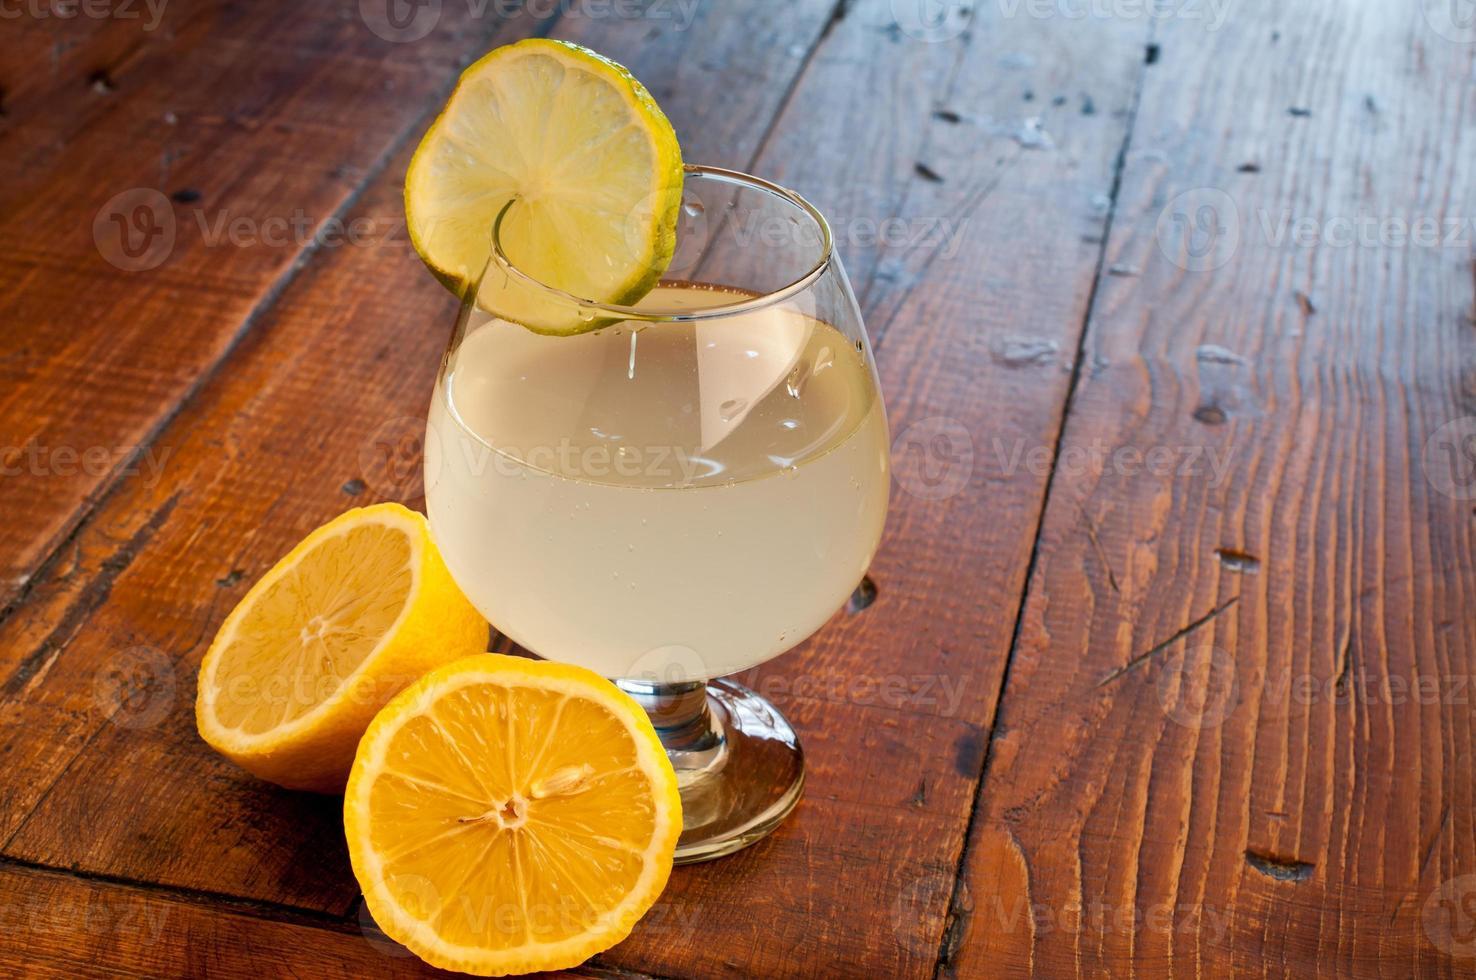 wine glass with sparkling lemonade lemon cut slice lime photo